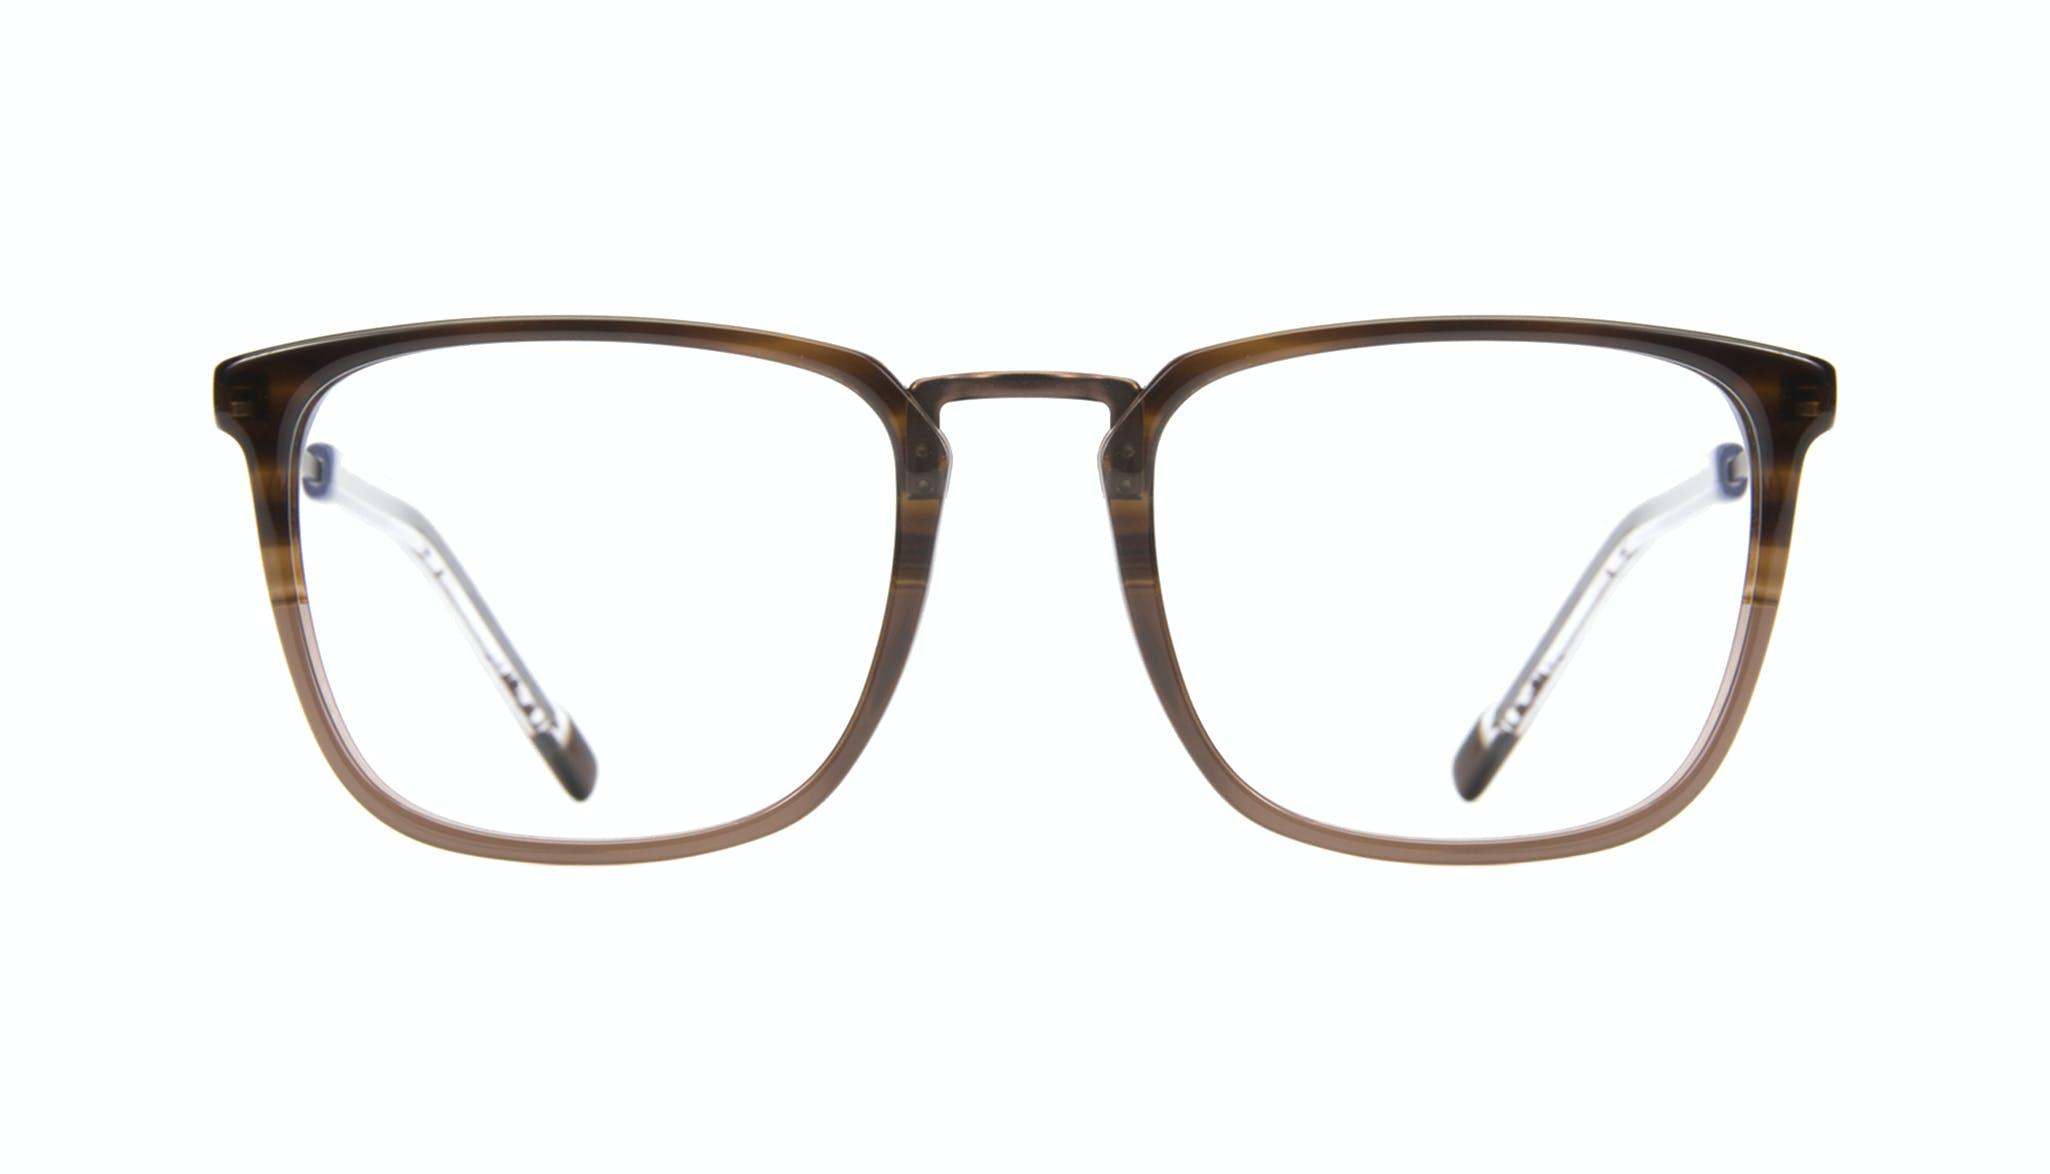 Affordable Fashion Glasses Rectangle Square Eyeglasses Men Current Mud Front